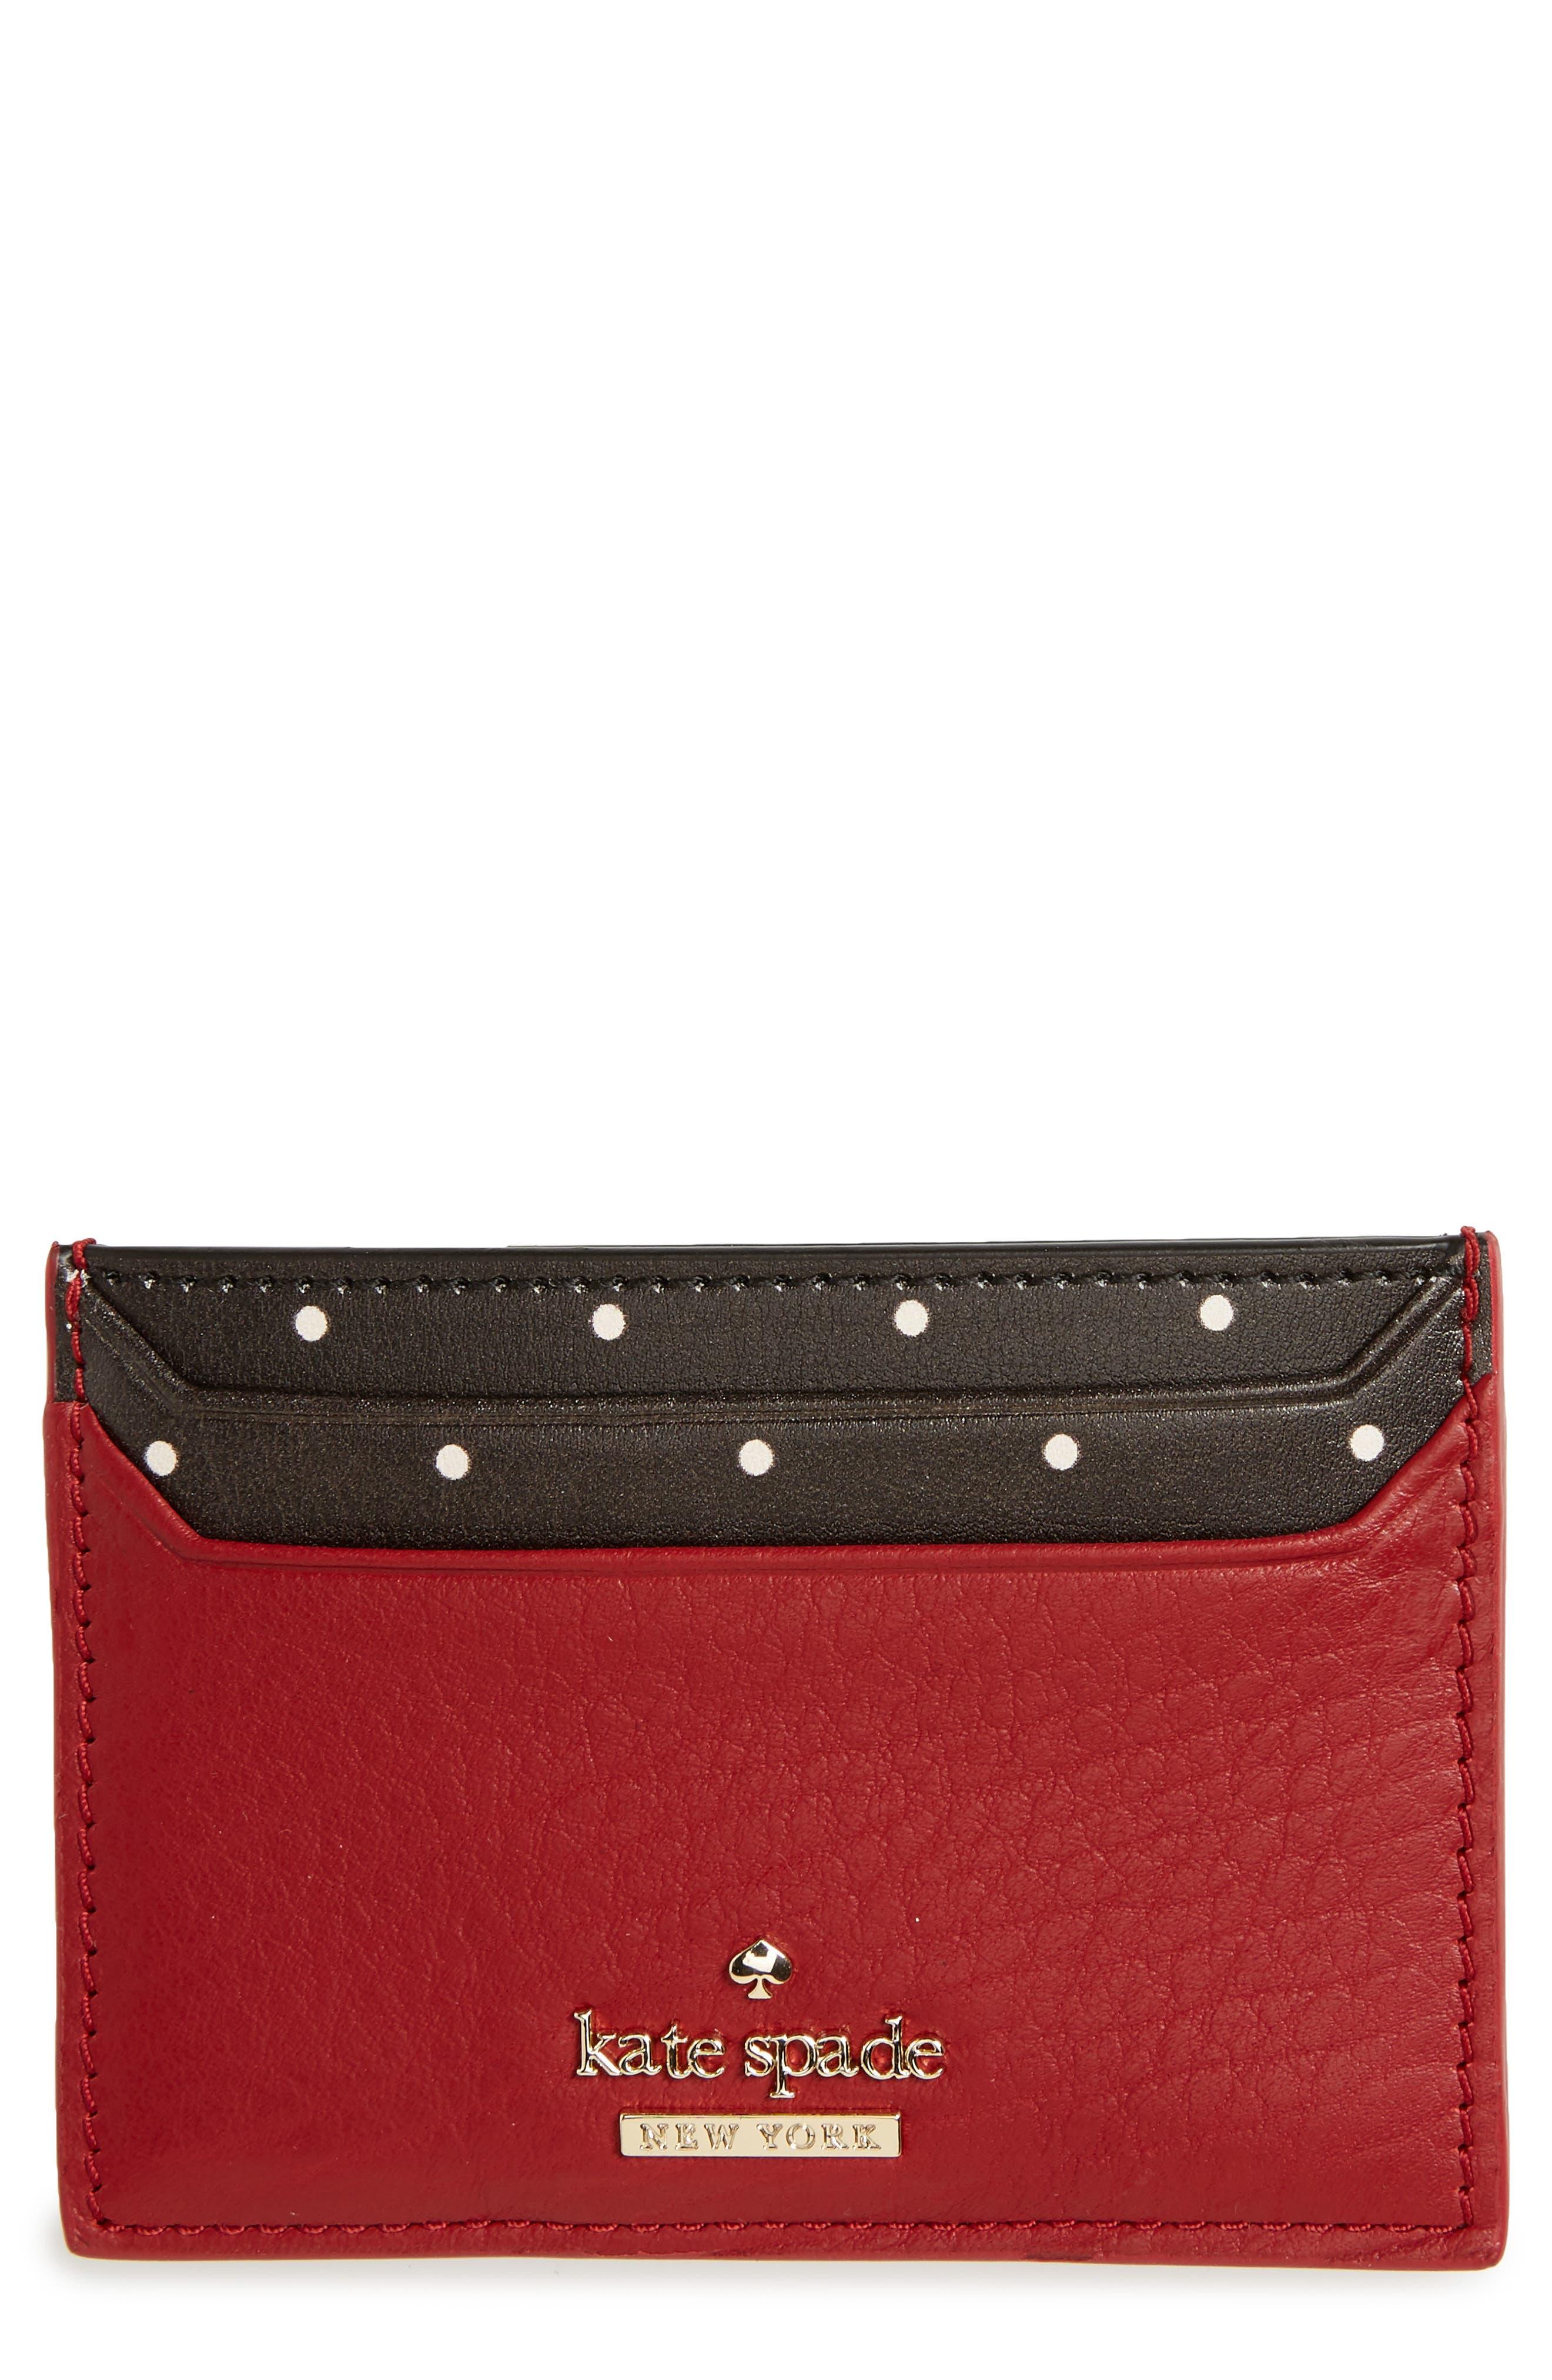 KATE SPADE NEW YORK blake street - dot lynleigh leather card case, Main, color, 600